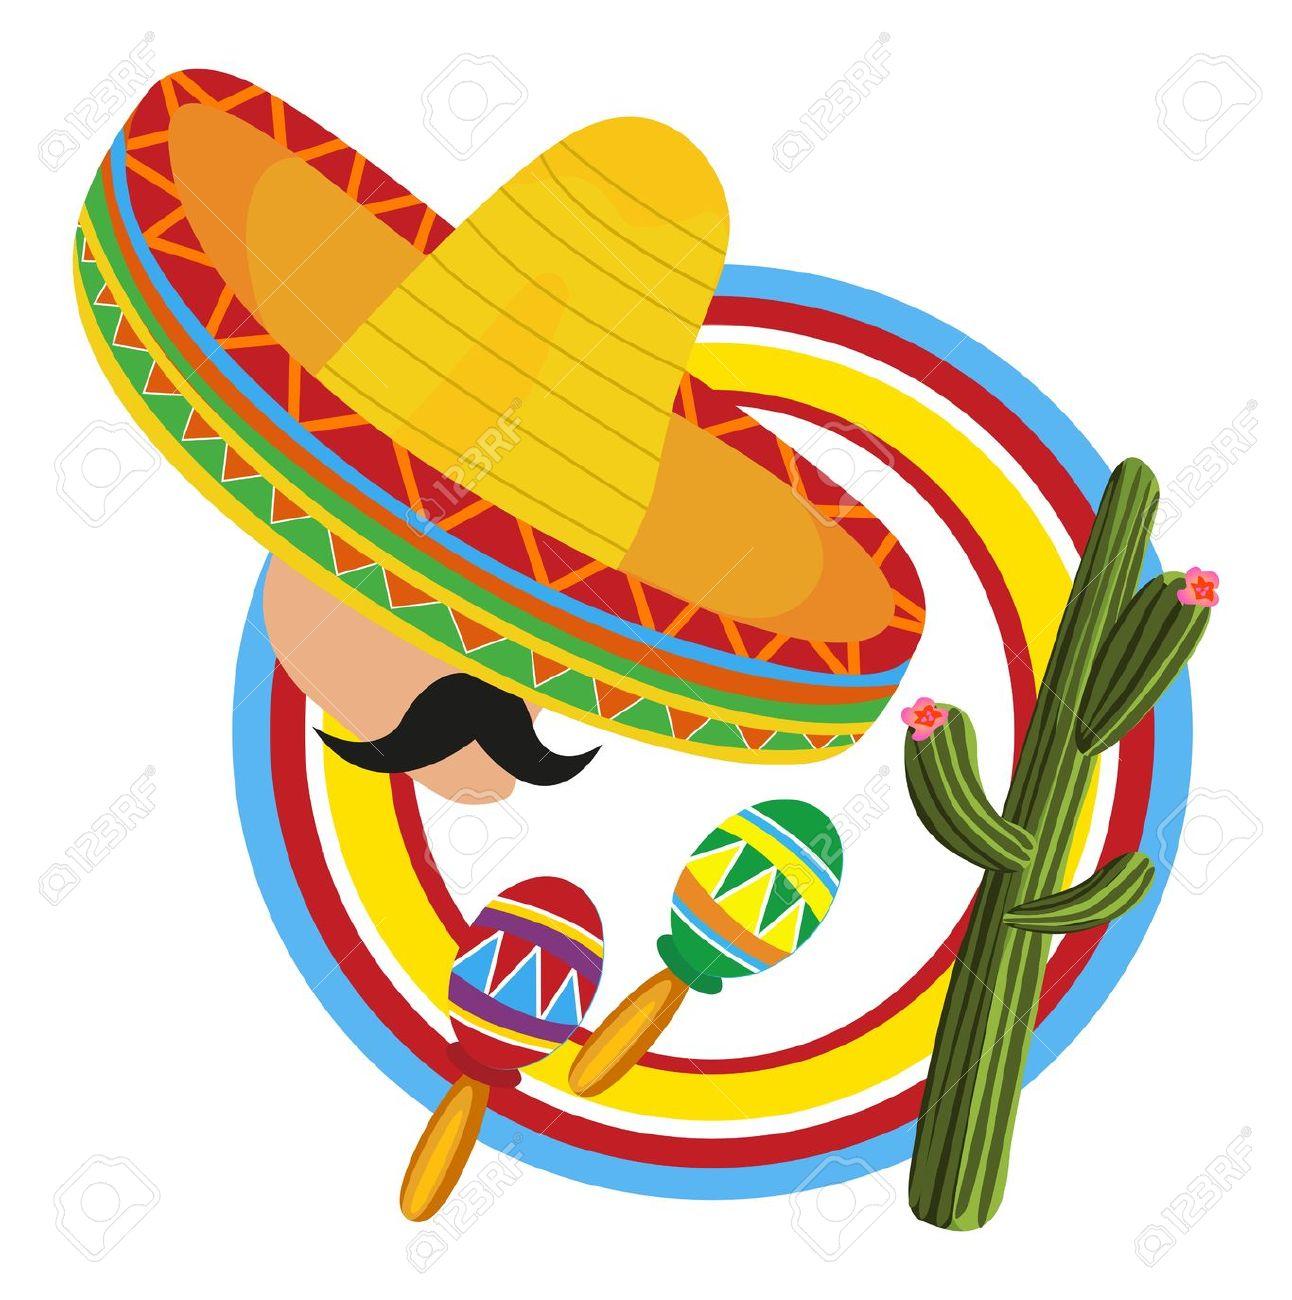 Maracas and sombrero clipart graphic royalty free stock Sombrero Clipart   Free download best Sombrero Clipart on ... graphic royalty free stock